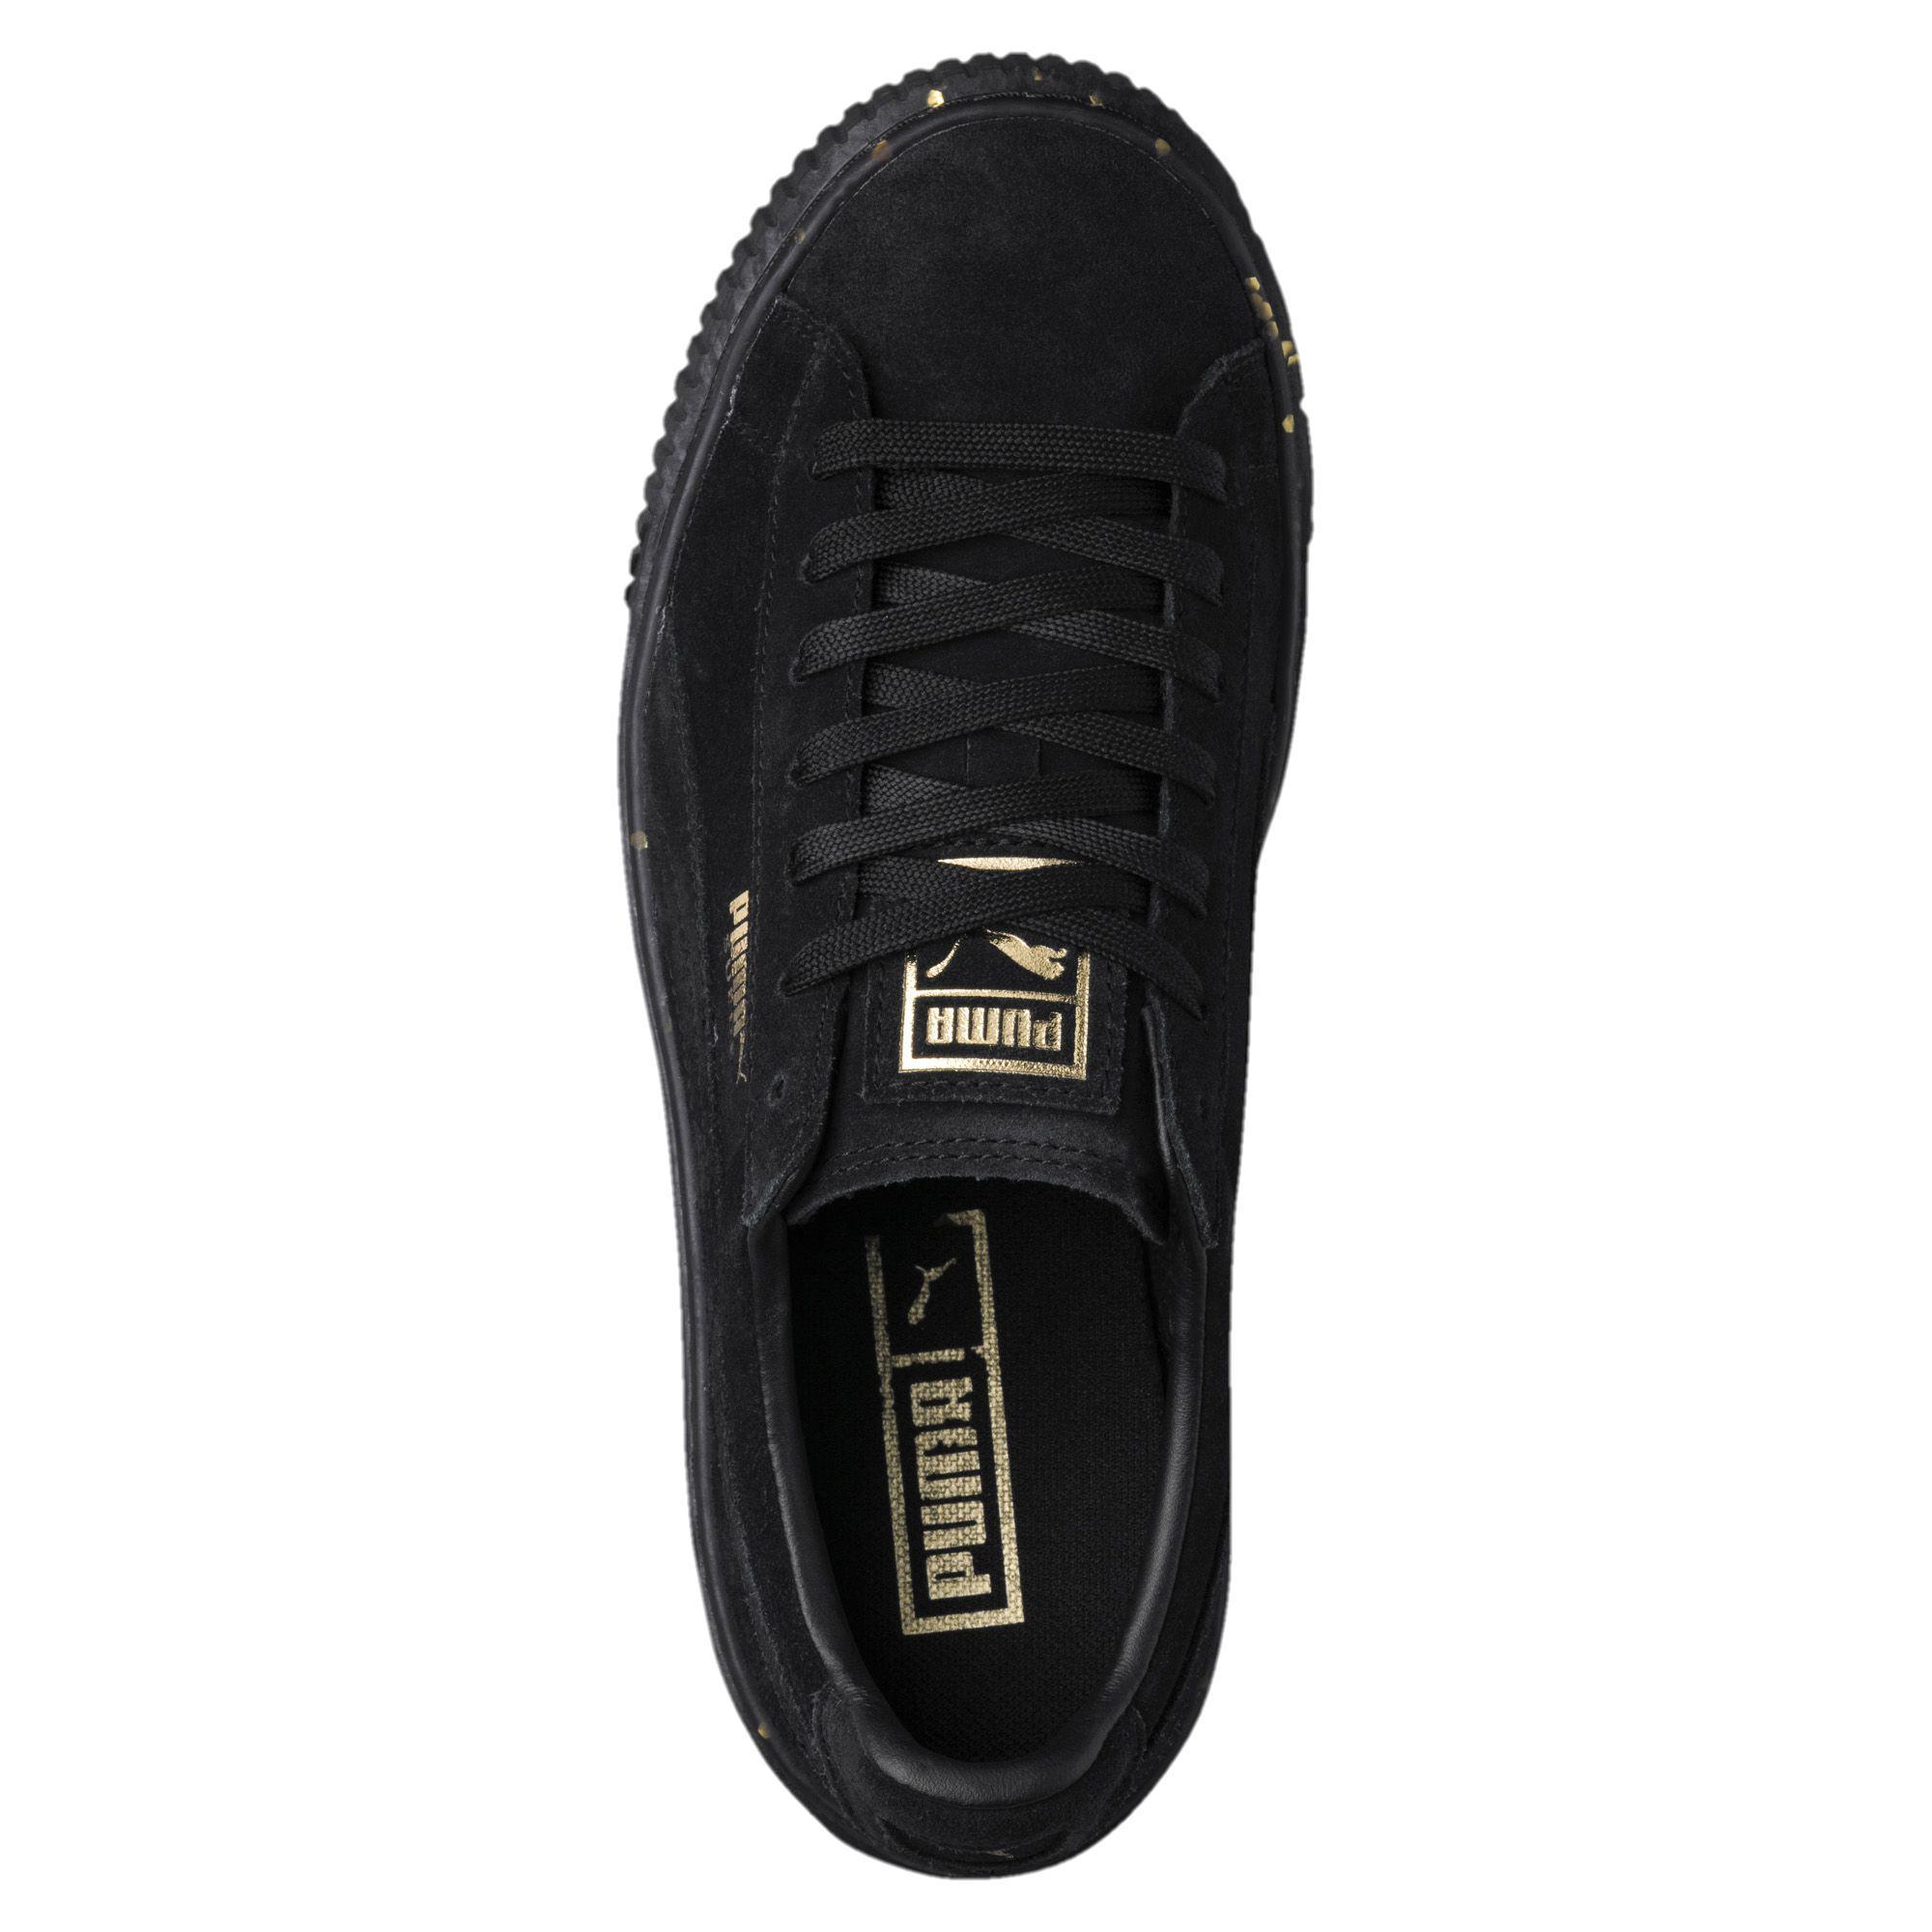 c97d083b574 Lyst - PUMA Suede Platform Celebrate Women s Sneakers in Black